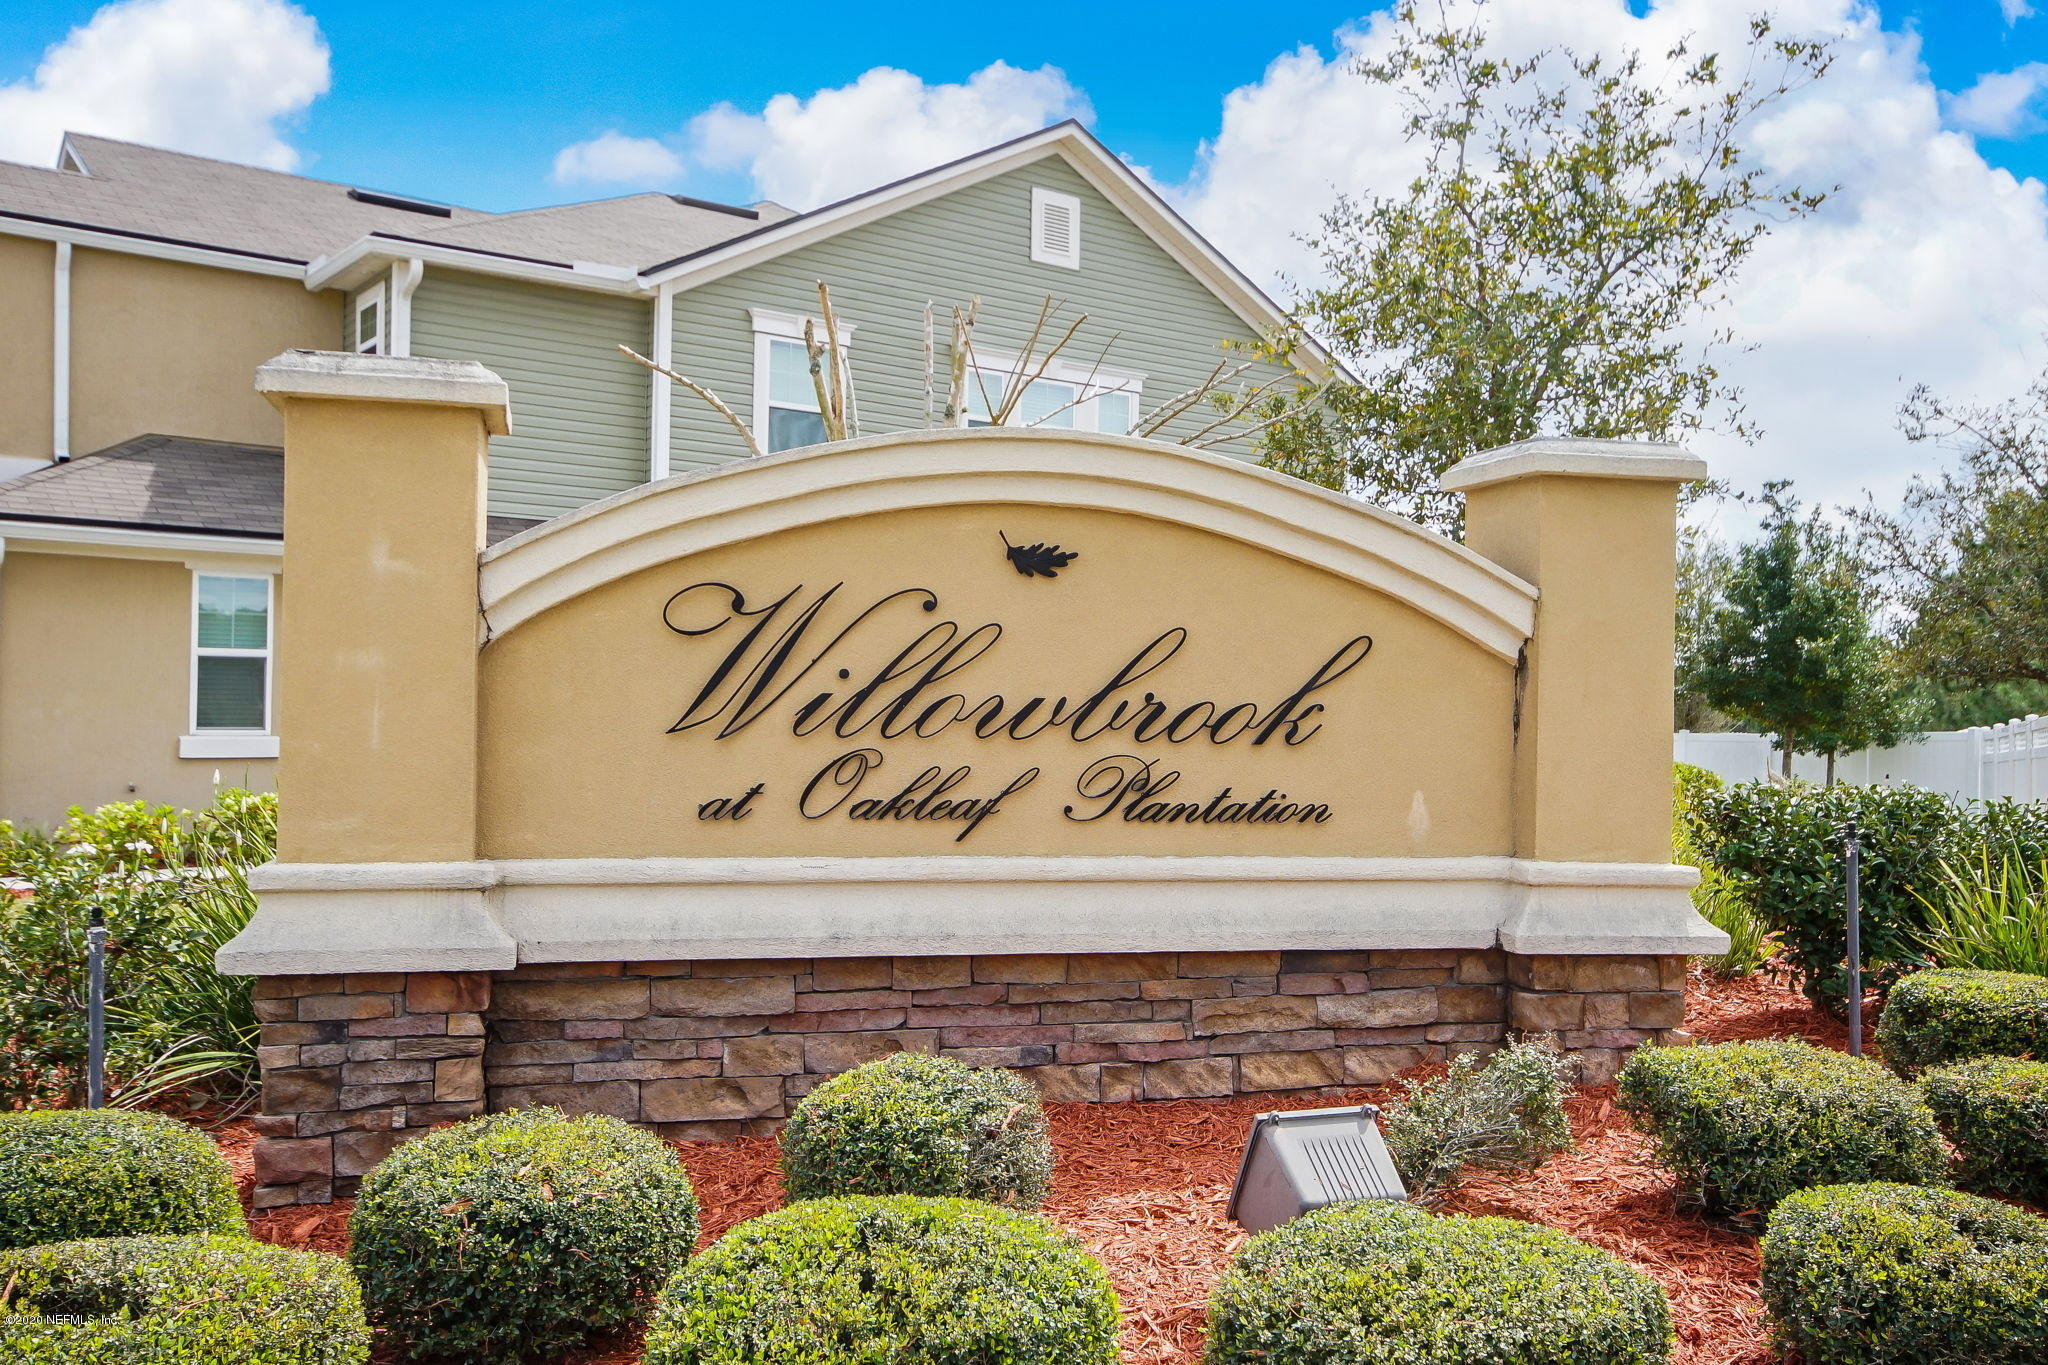 3726 AUBREY, ORANGE PARK, FLORIDA 32065, 3 Bedrooms Bedrooms, ,2 BathroomsBathrooms,Residential,For sale,AUBREY,1044335